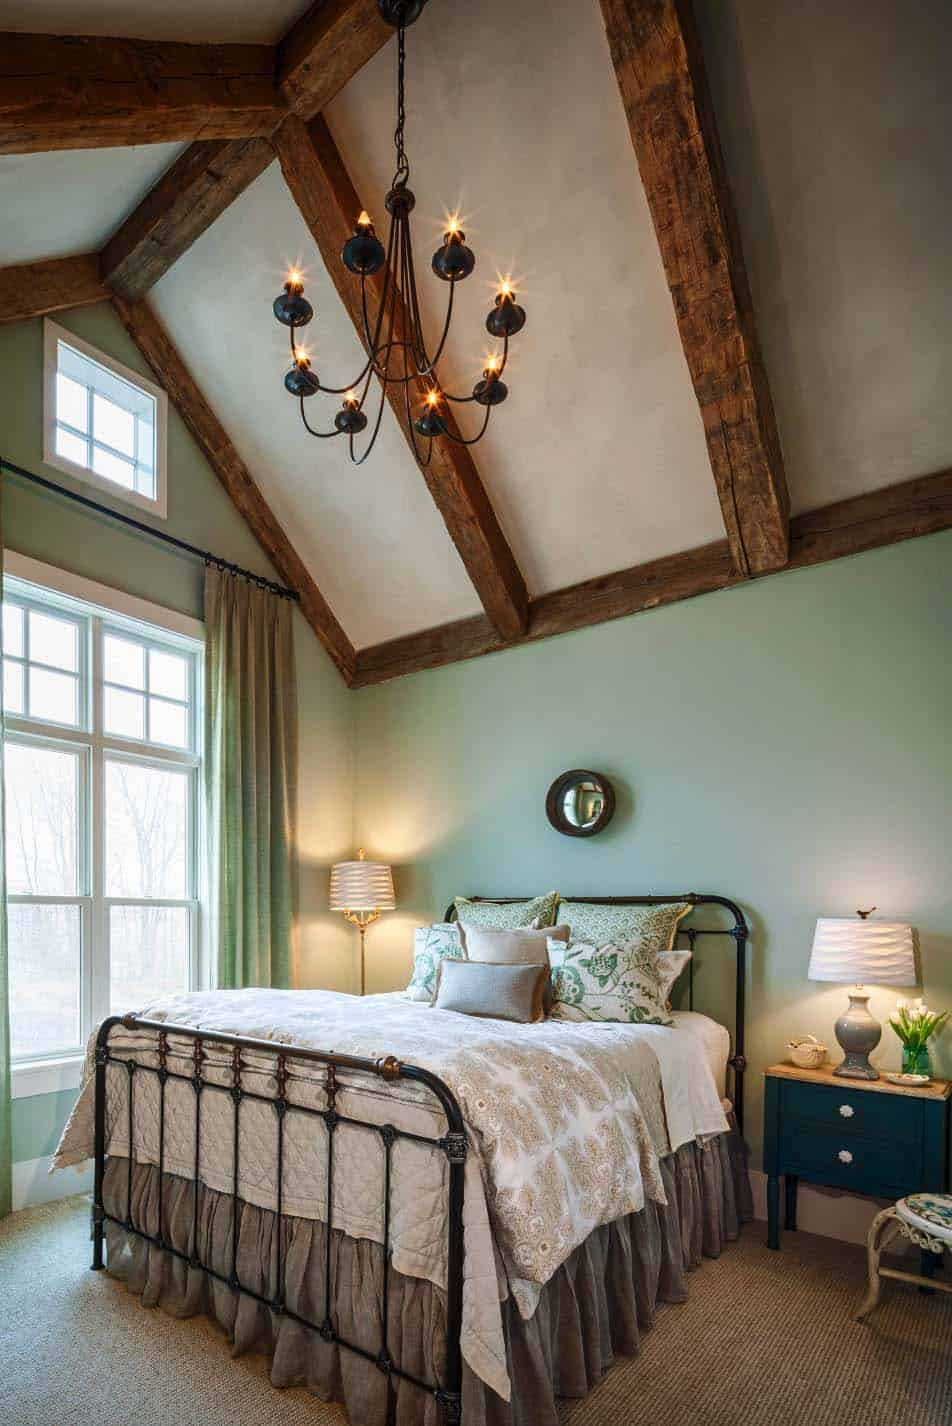 25 Absolutely breathtaking farmhouse style bedroom ideas ... on Bedroom Farmhouse Decor  id=82529